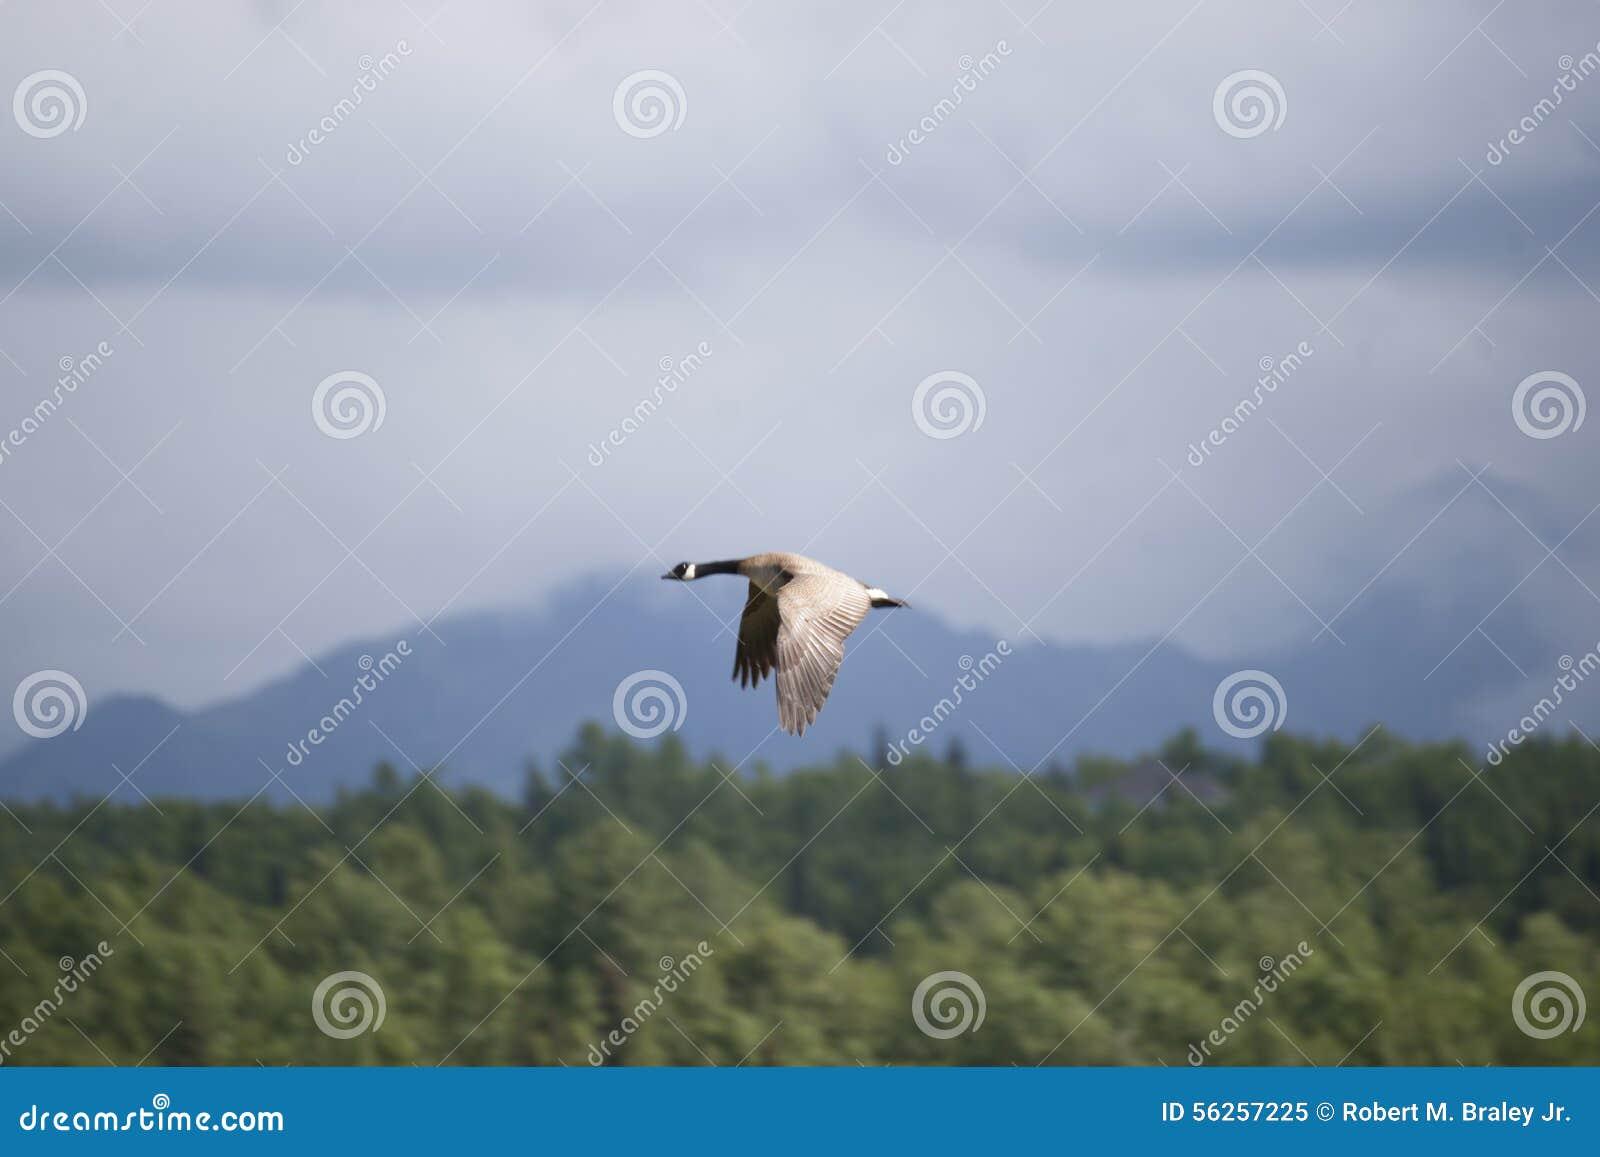 Download Potter Marsh Wildlife Refuge Anchorage Alaska Stock Image - Image of viewing, alaska: 56257225